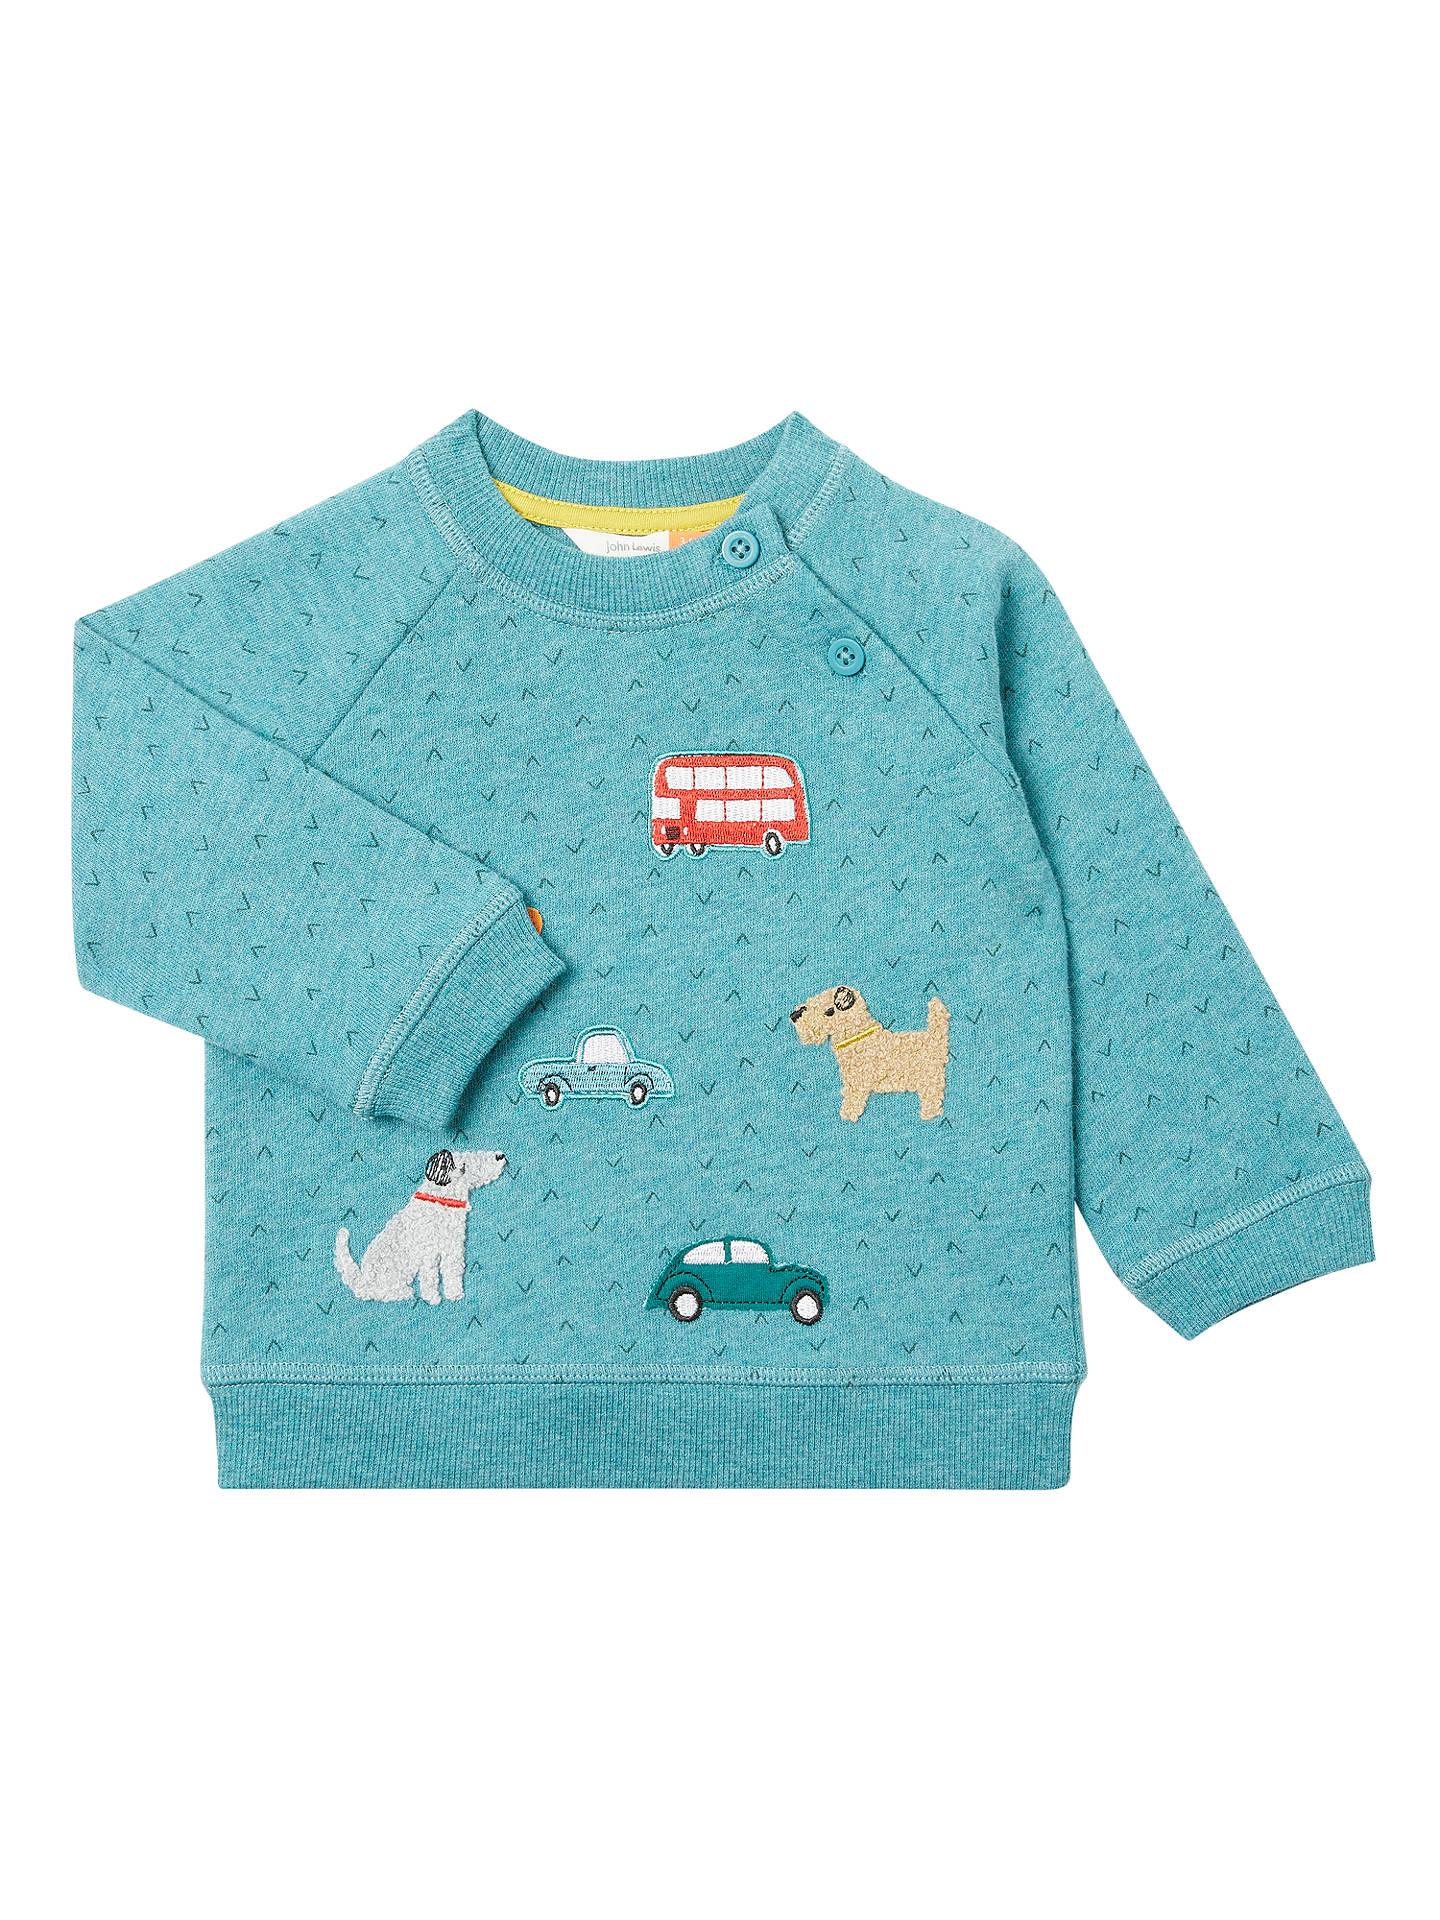 a864b2e57057 John Lewis Baby Dog and Car Badge Sweatshirt